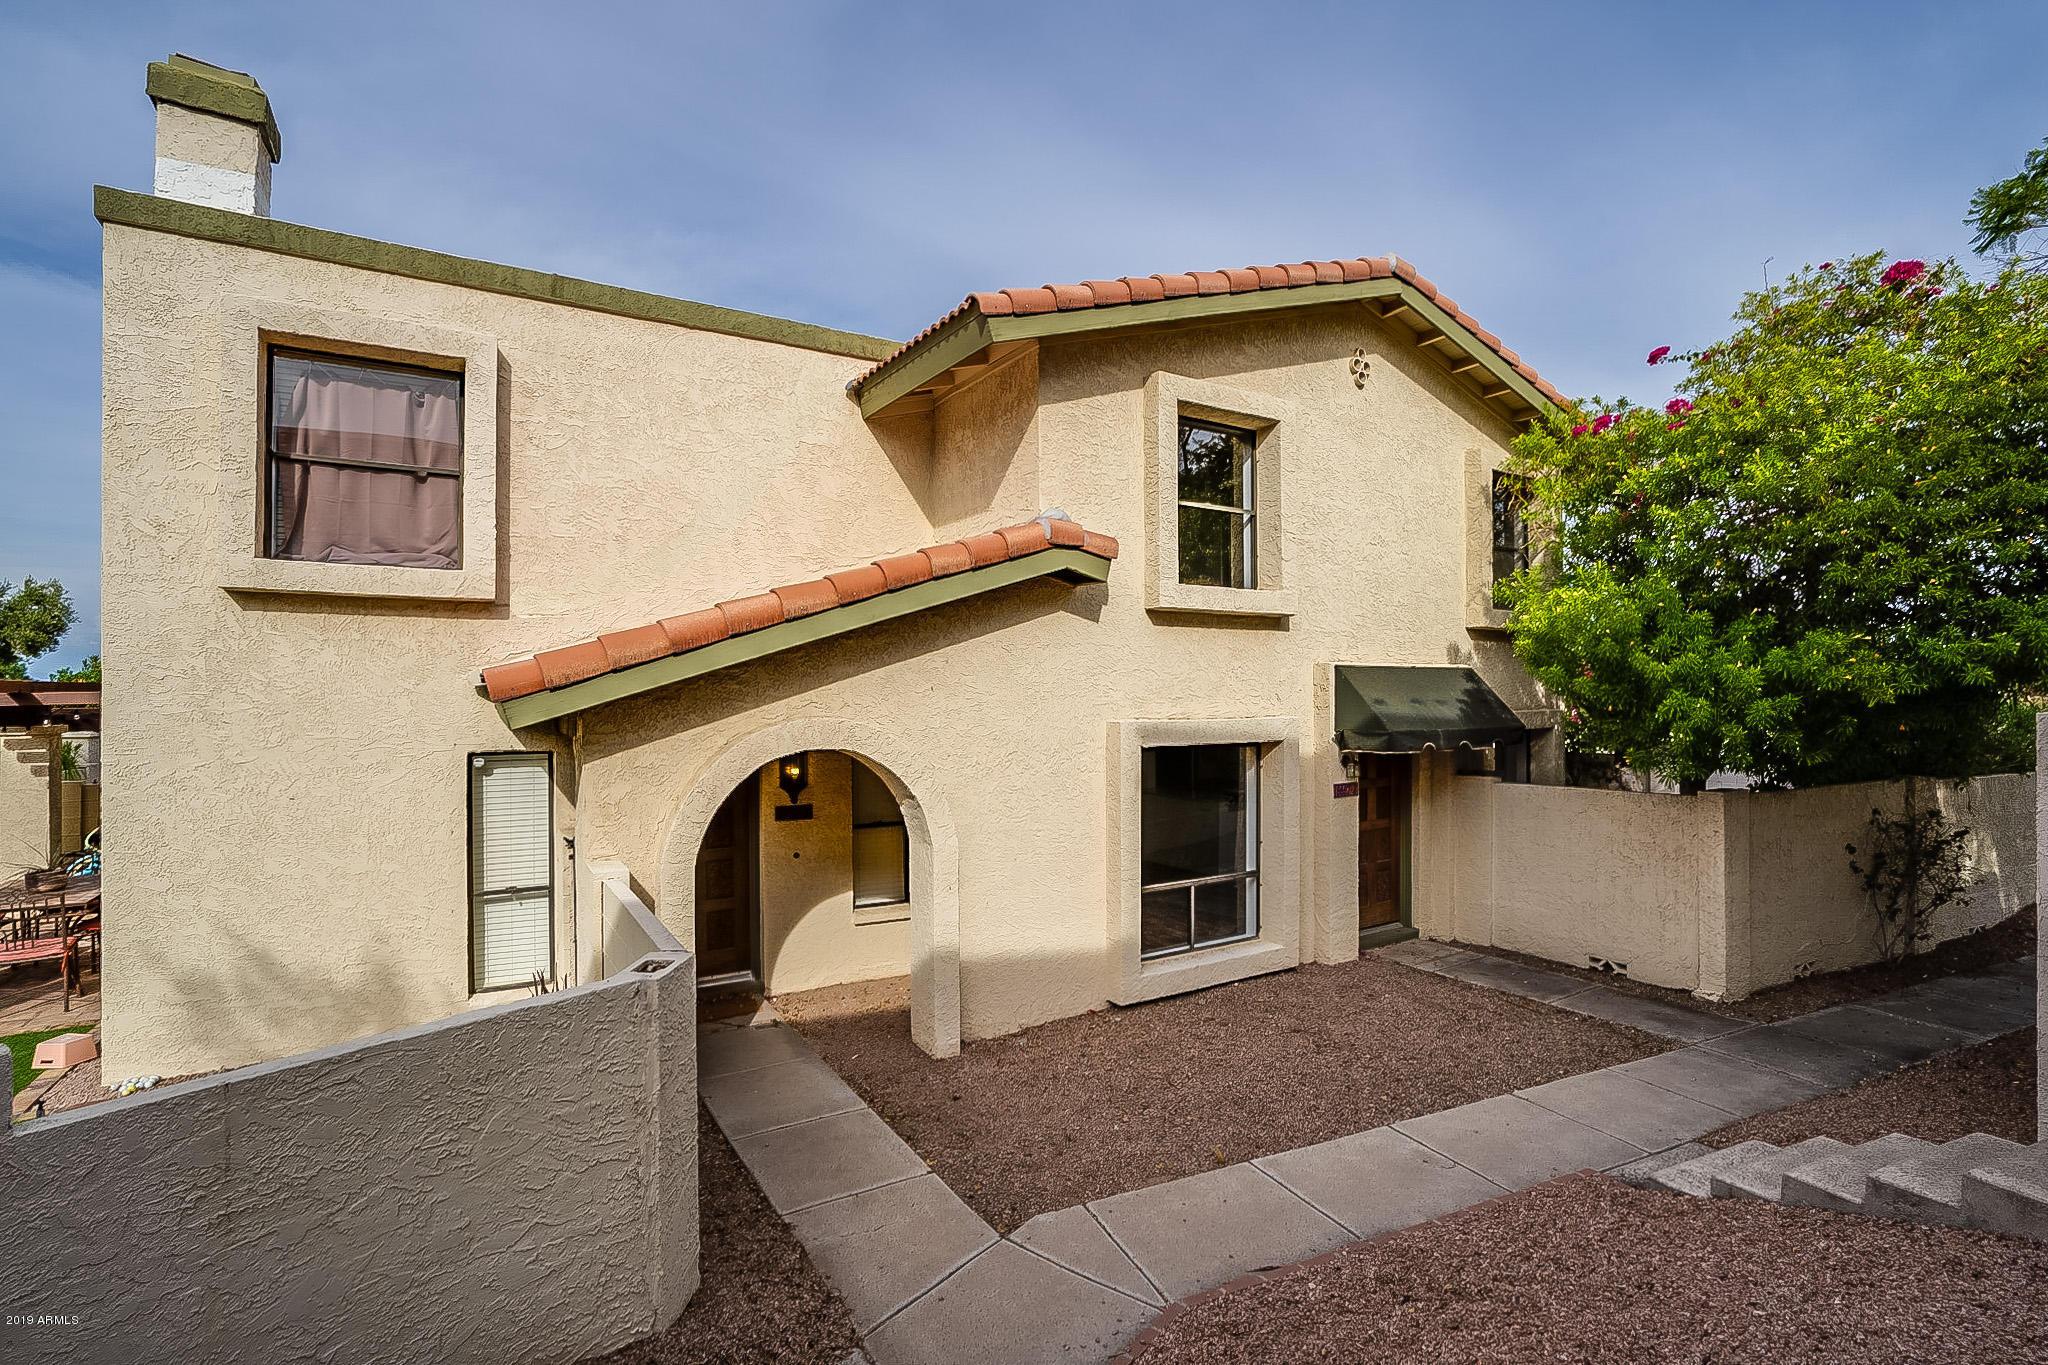 MLS 5960618 8657 S 51ST Street Unit 3, Phoenix, AZ 85044 Ahwatukee Community AZ Condo or Townhome